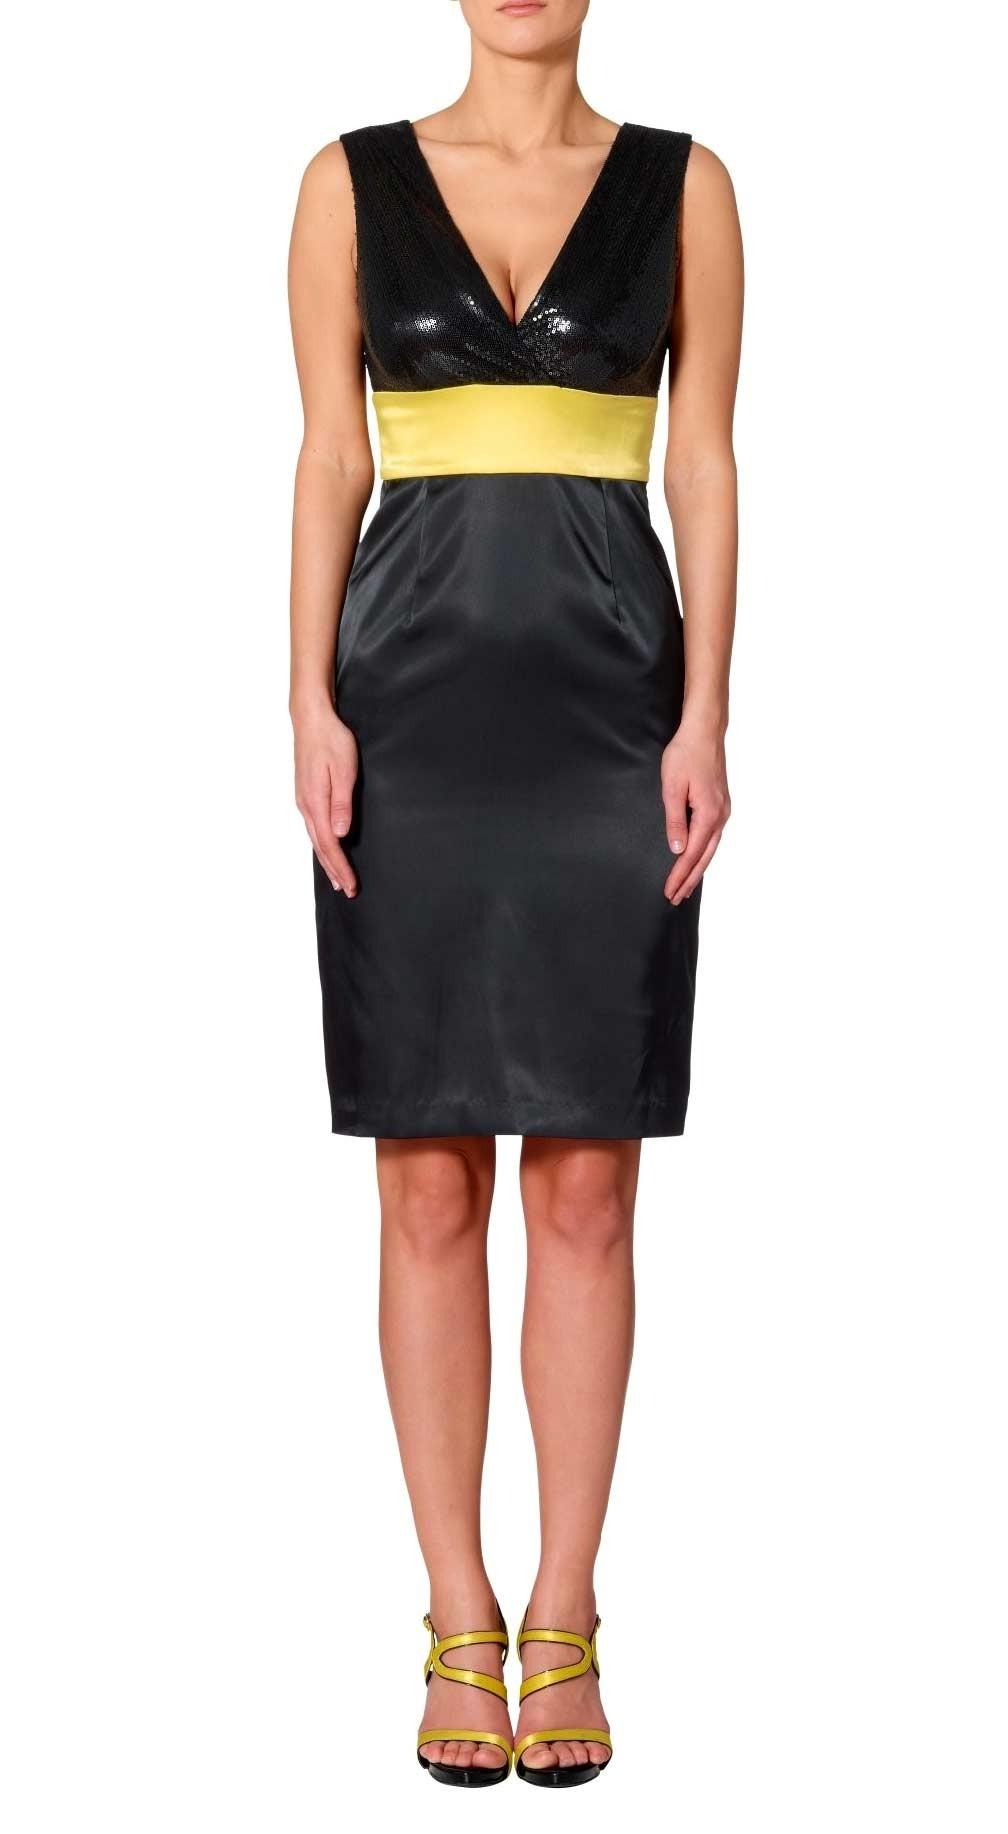 451aa69a618 Černé pouzdrové saténové šaty s flitry APART